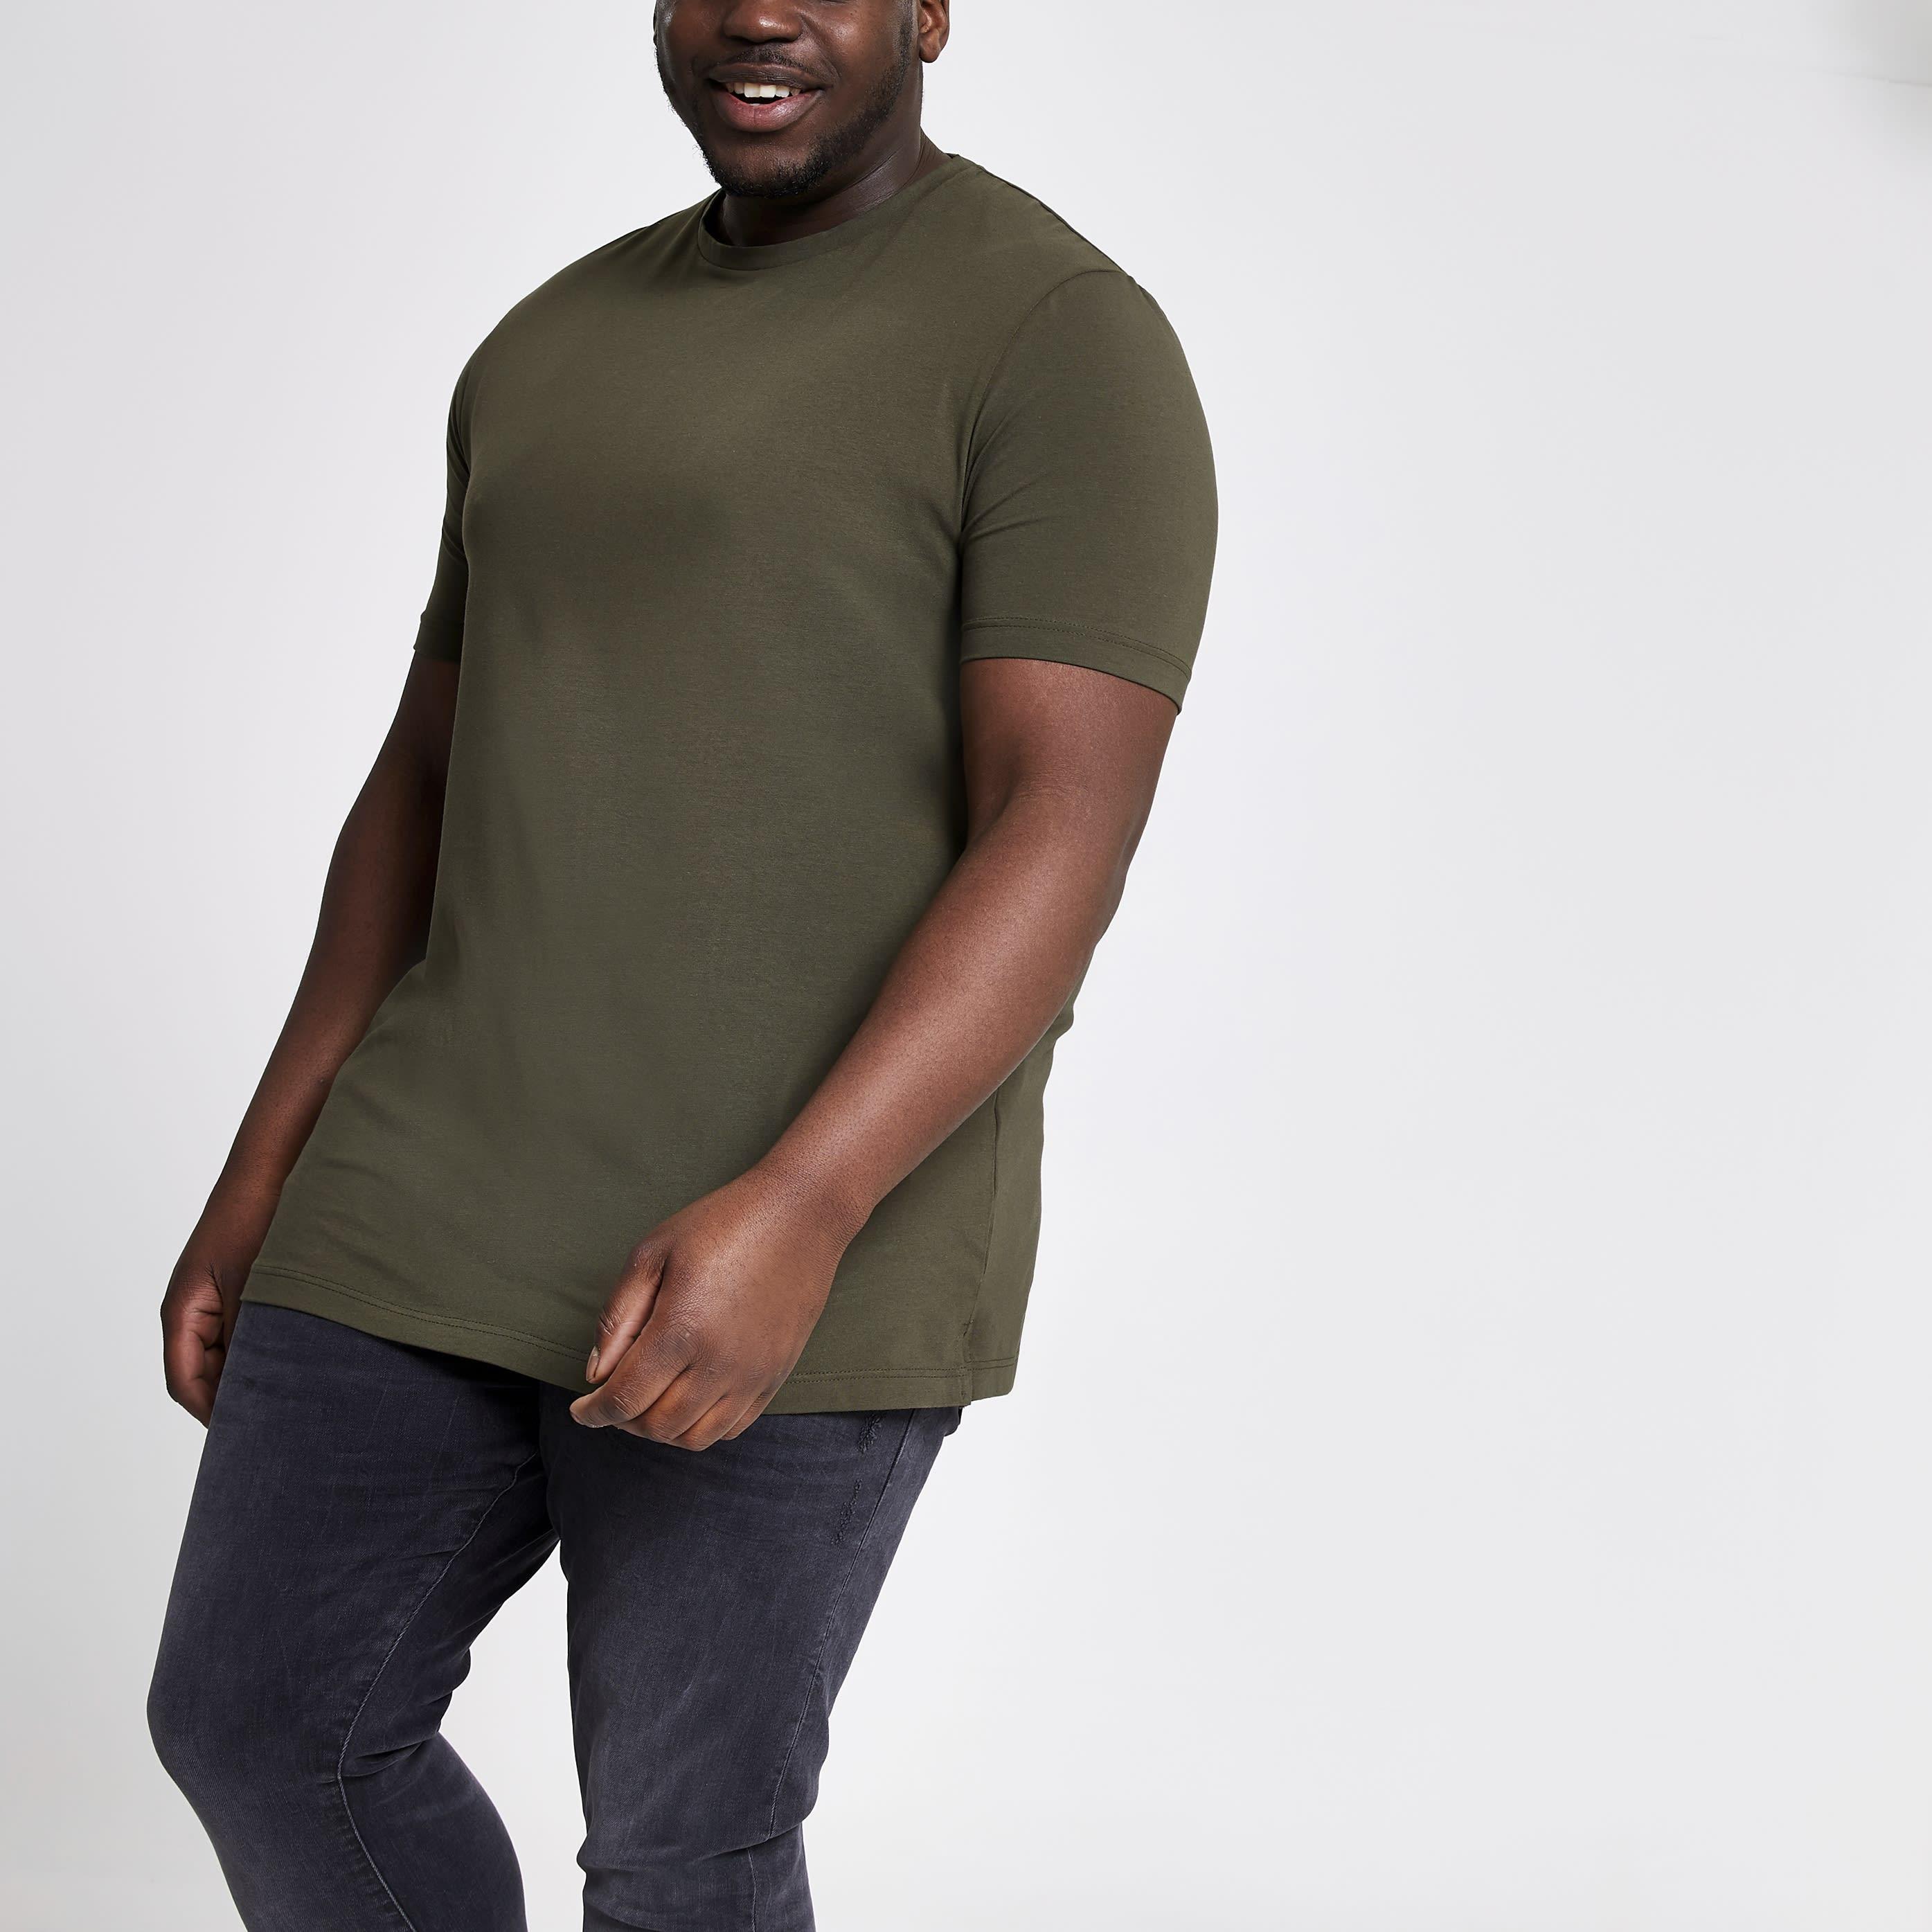 River Island Mens Big and Tall dark Green muscle fit T-shirt (XL)